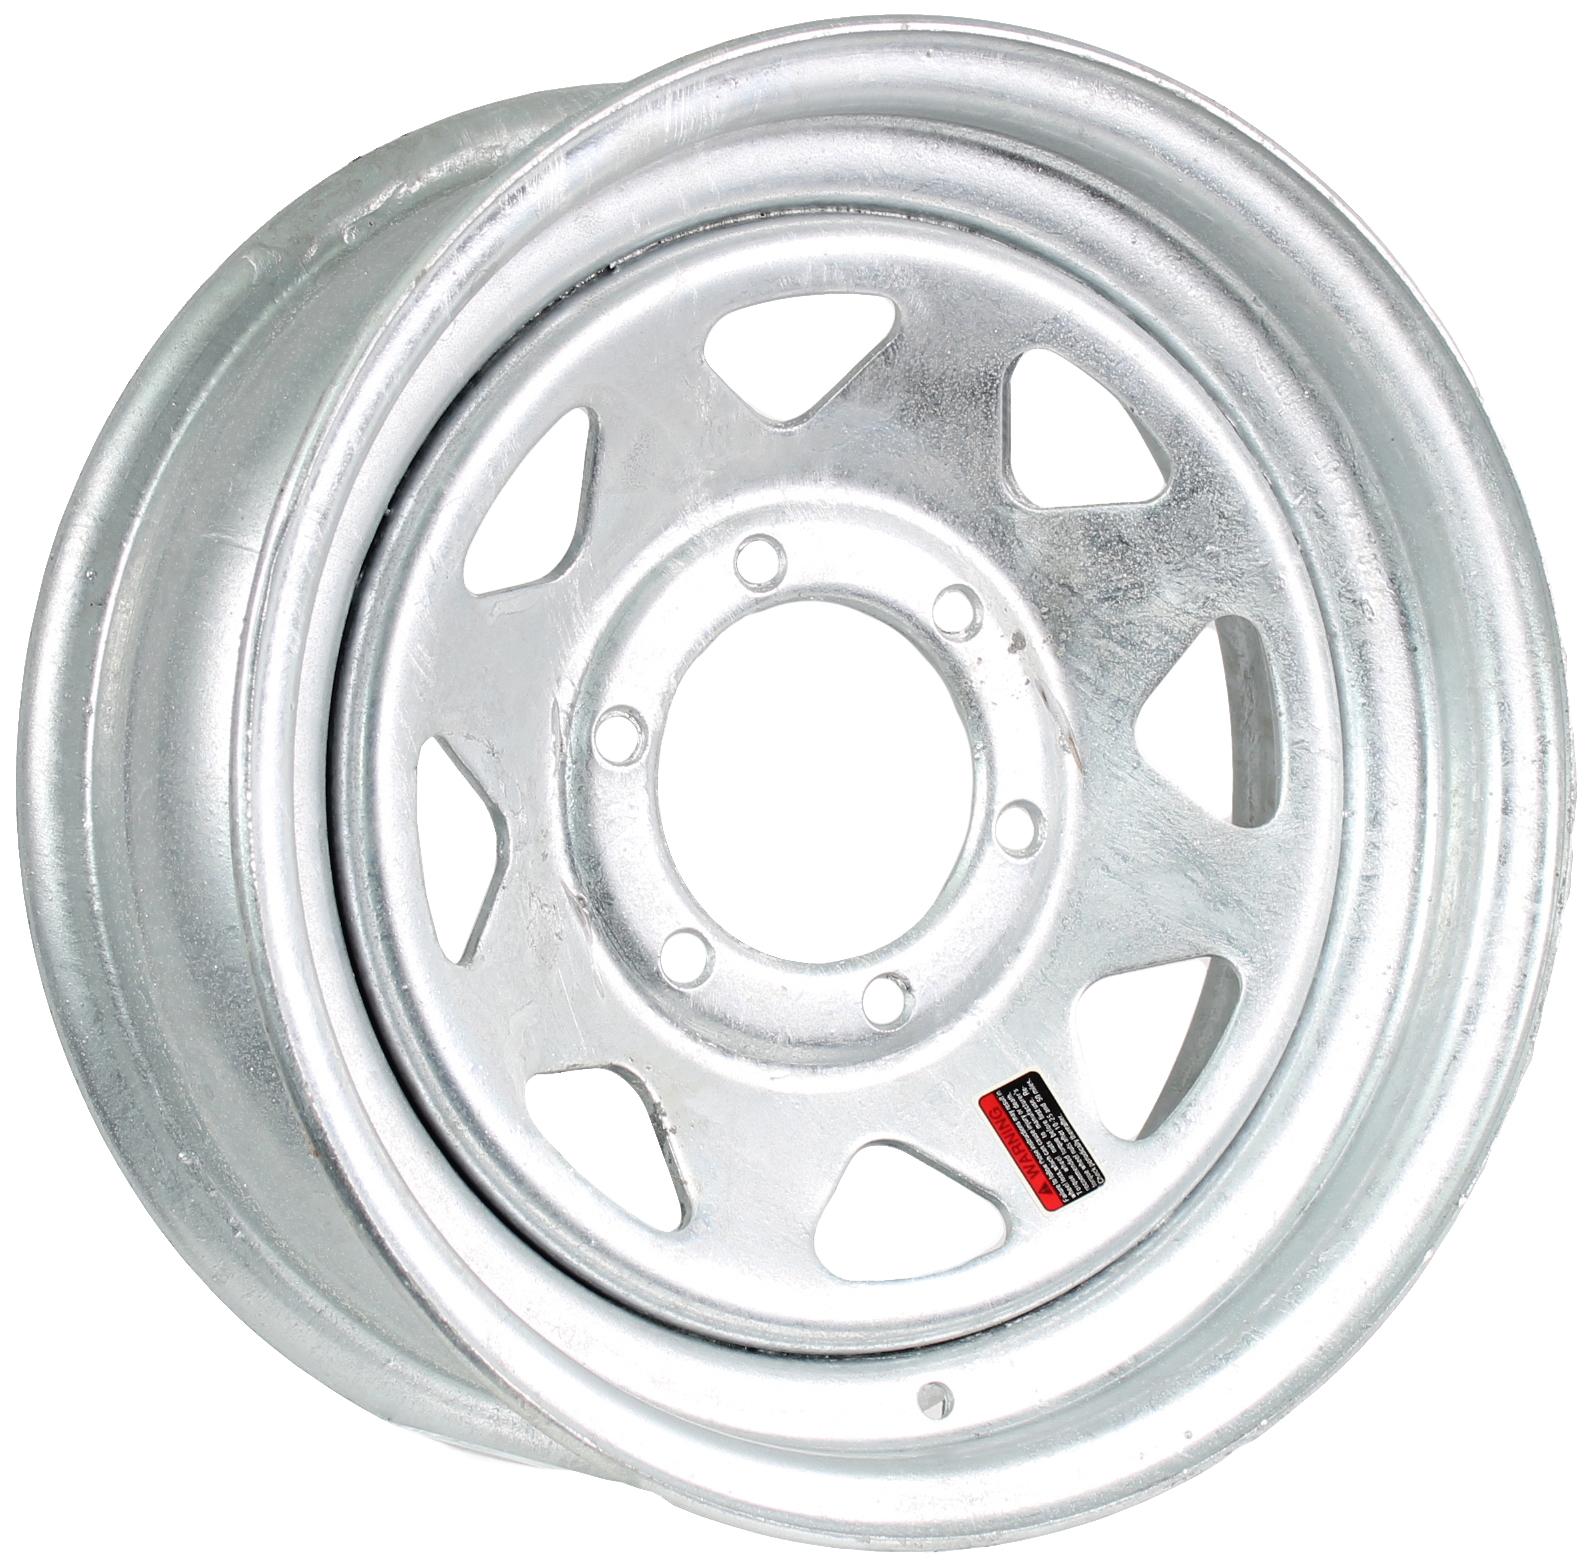 15x6 6-Lug Galvanized Steel Trailer Wheel Image